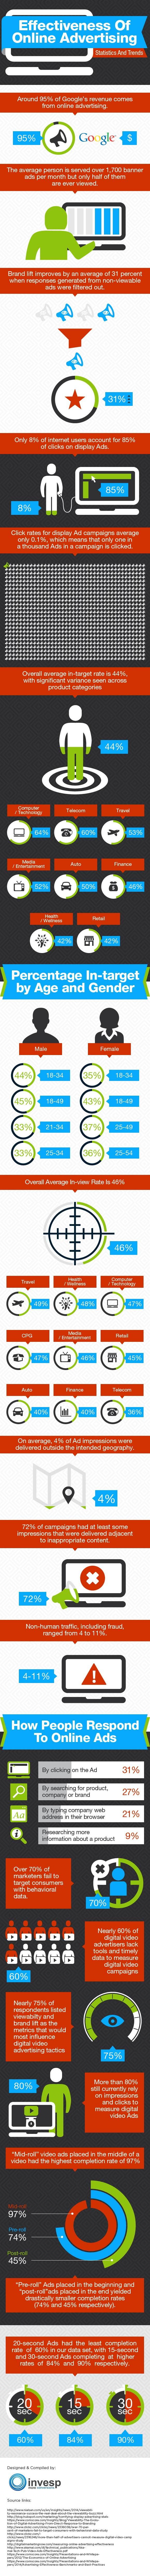 Effectiveness of online advertising: statistics & trends - #infographic #internetmarketing